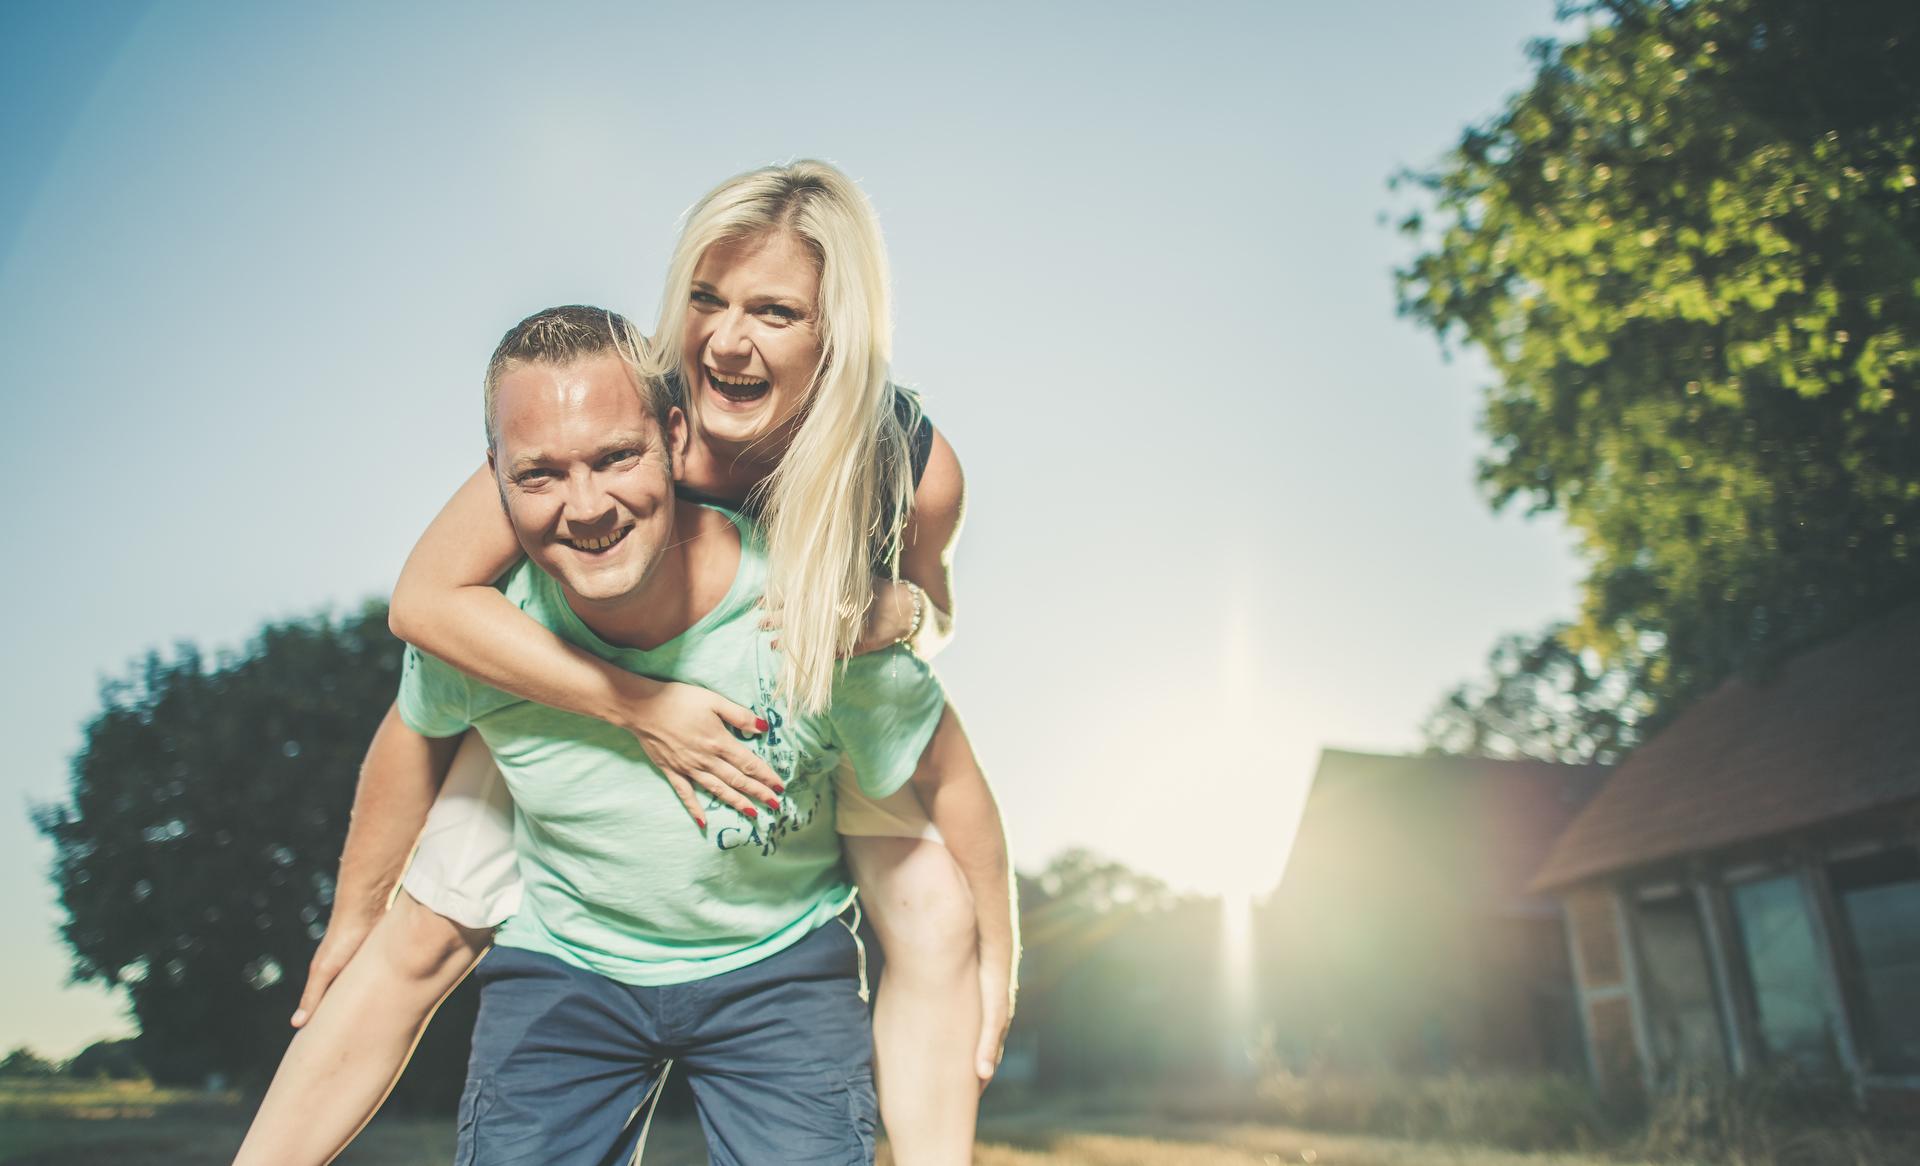 Engagement Shooting mit Tina & Alex am 05.08.2018 in Warendorf